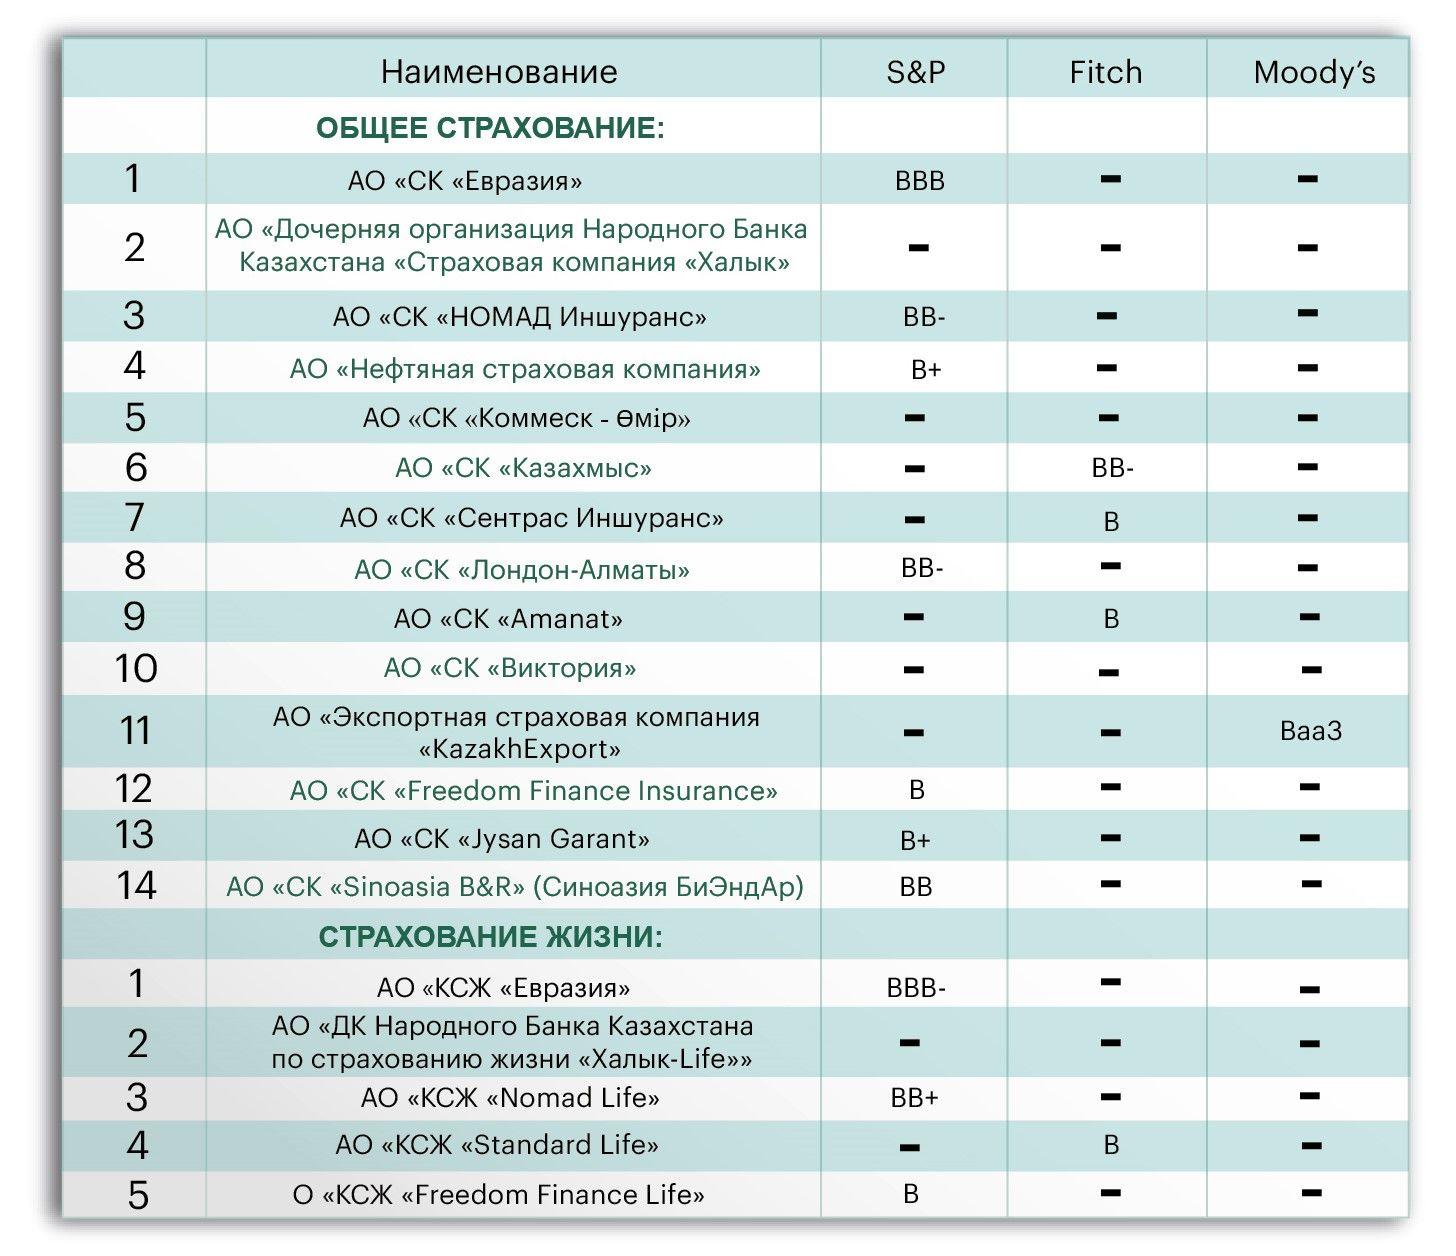 Как выглядят рейтинги страховщиков Казахстана от S&P, Fitch и Moody's 511280 - Kapital.kz